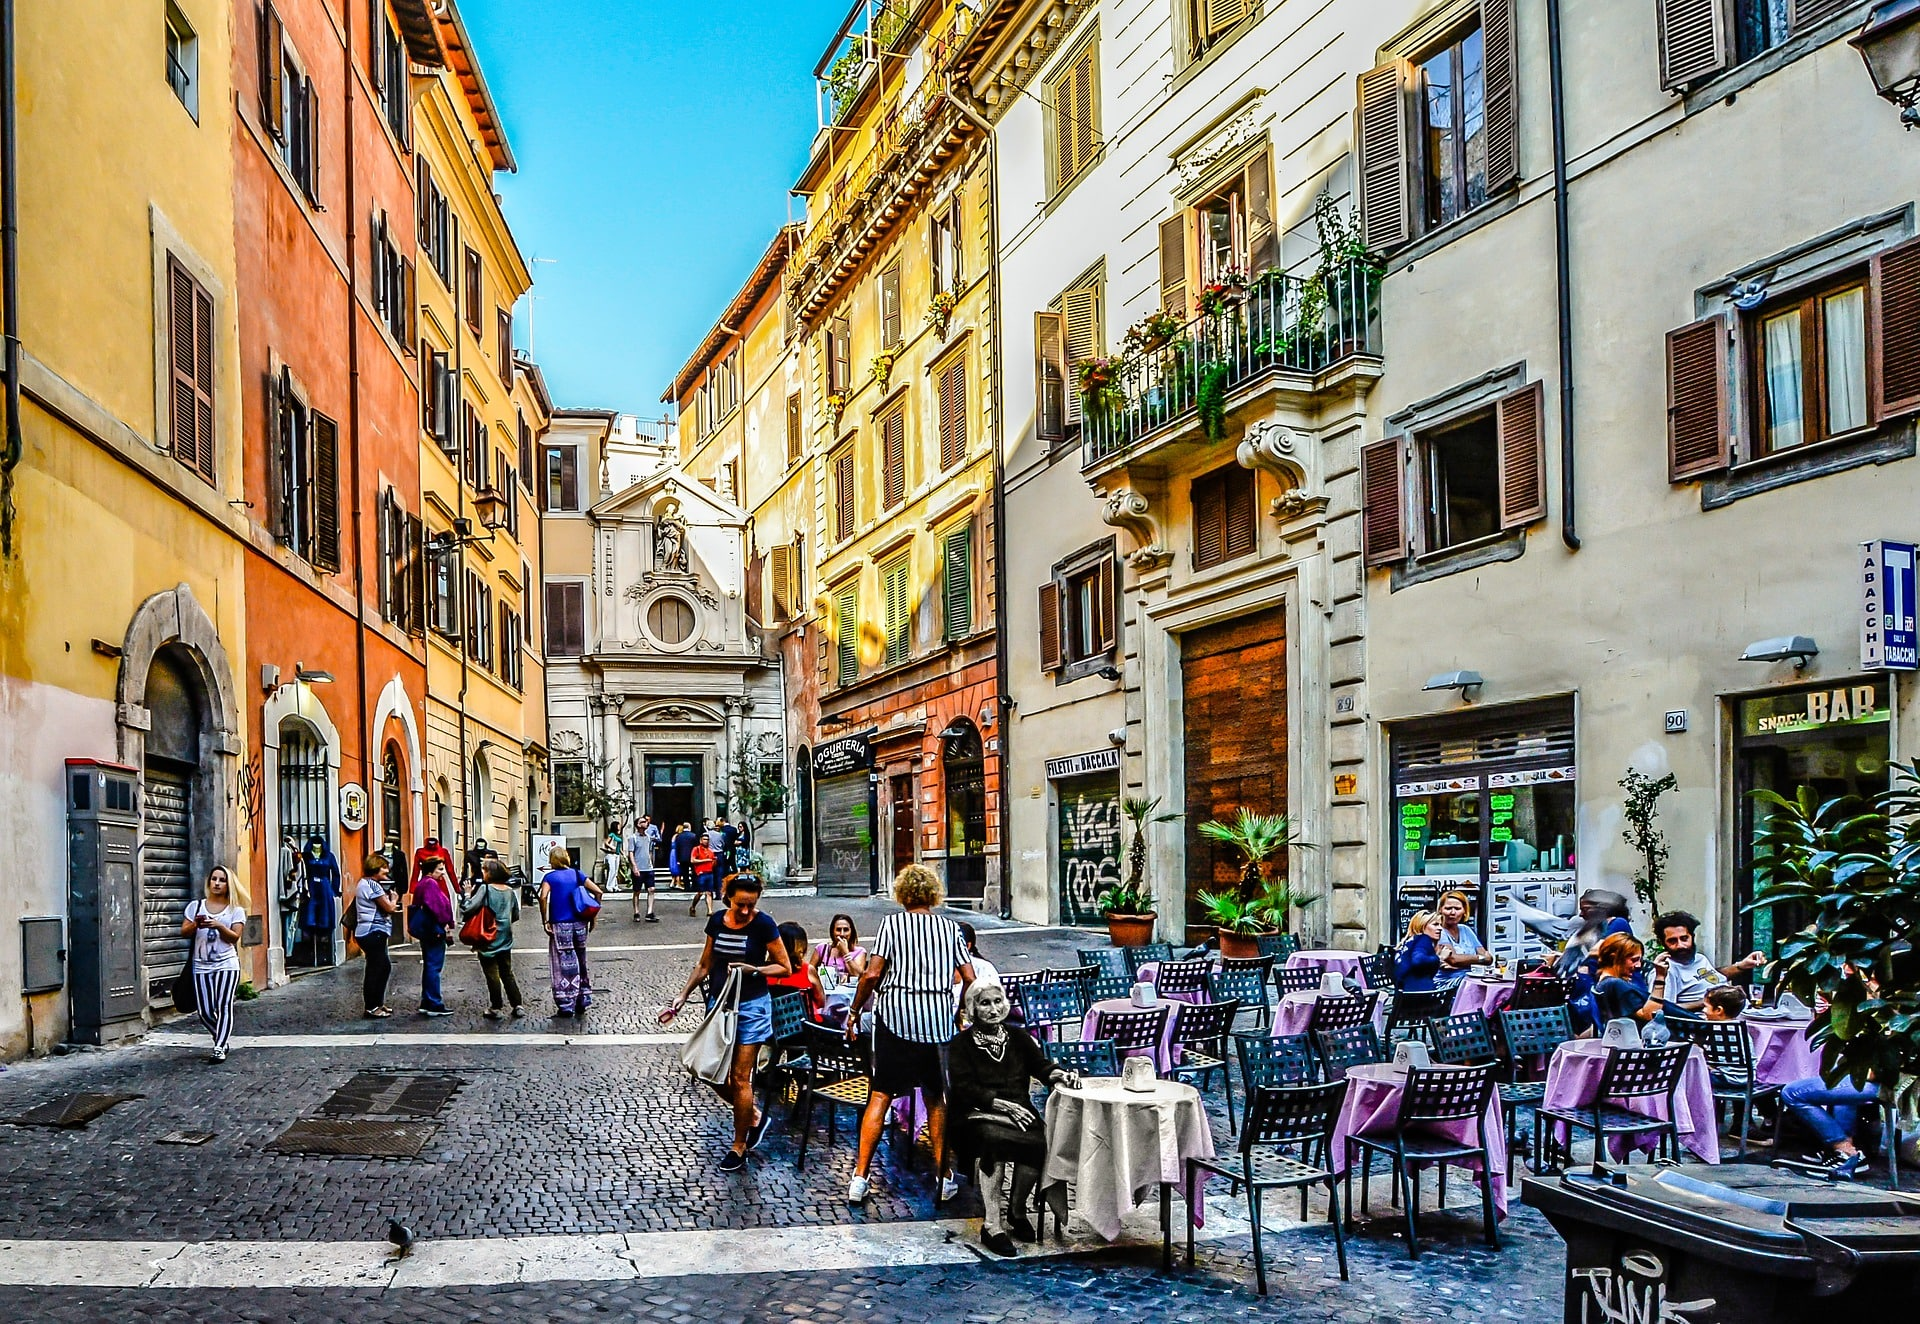 Is Italy Safe? Yes, definitely